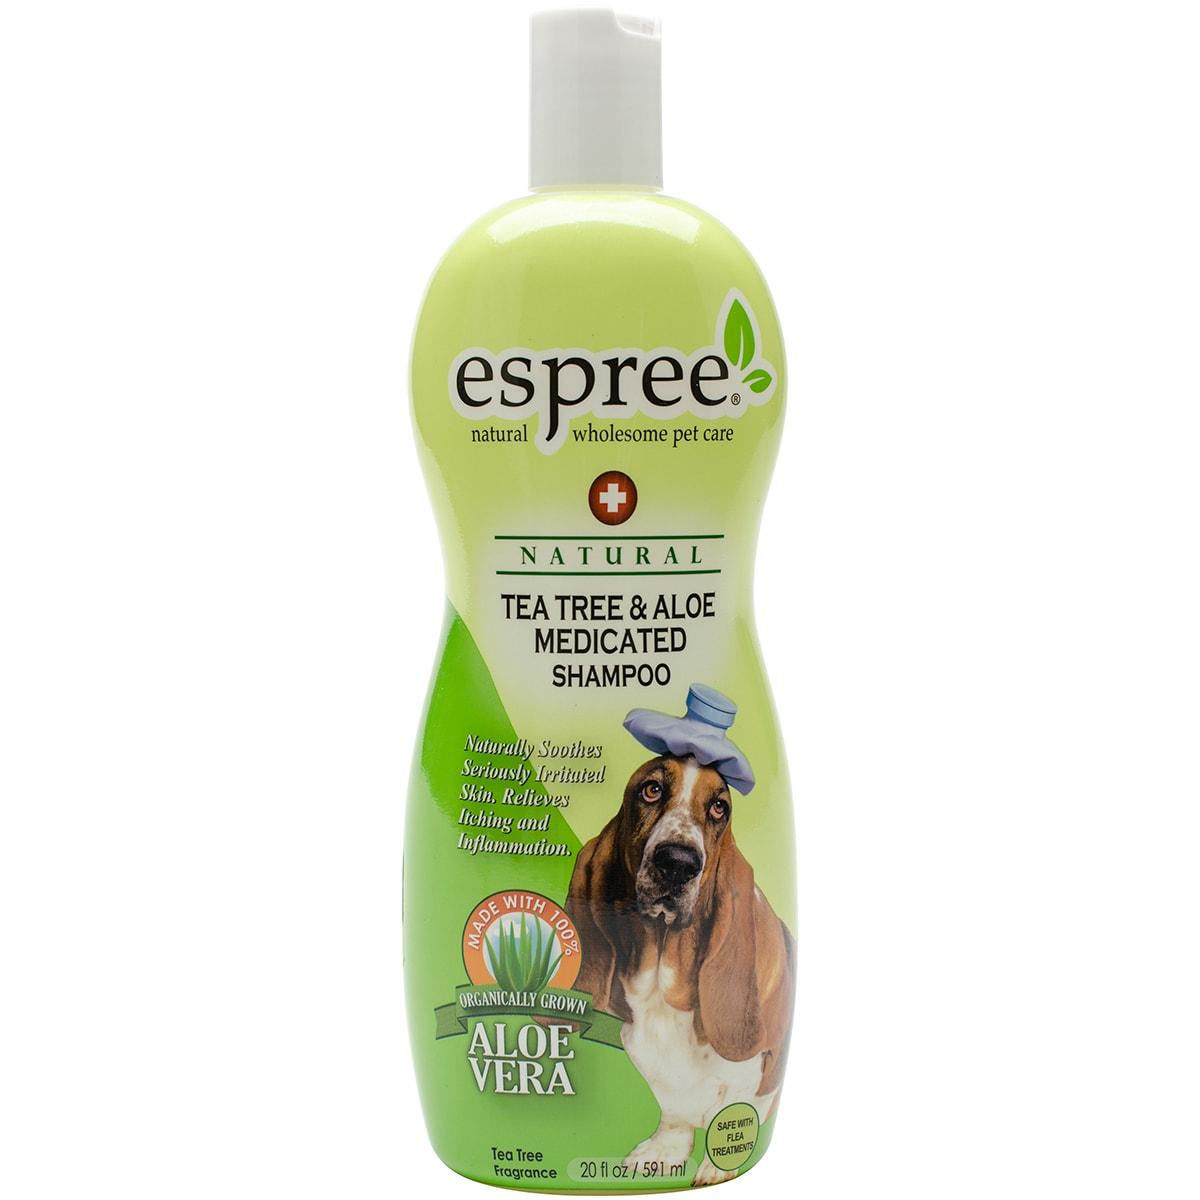 Espree Natural Tea Tree & Aloe Medicated Pet Shampoo 20oz...